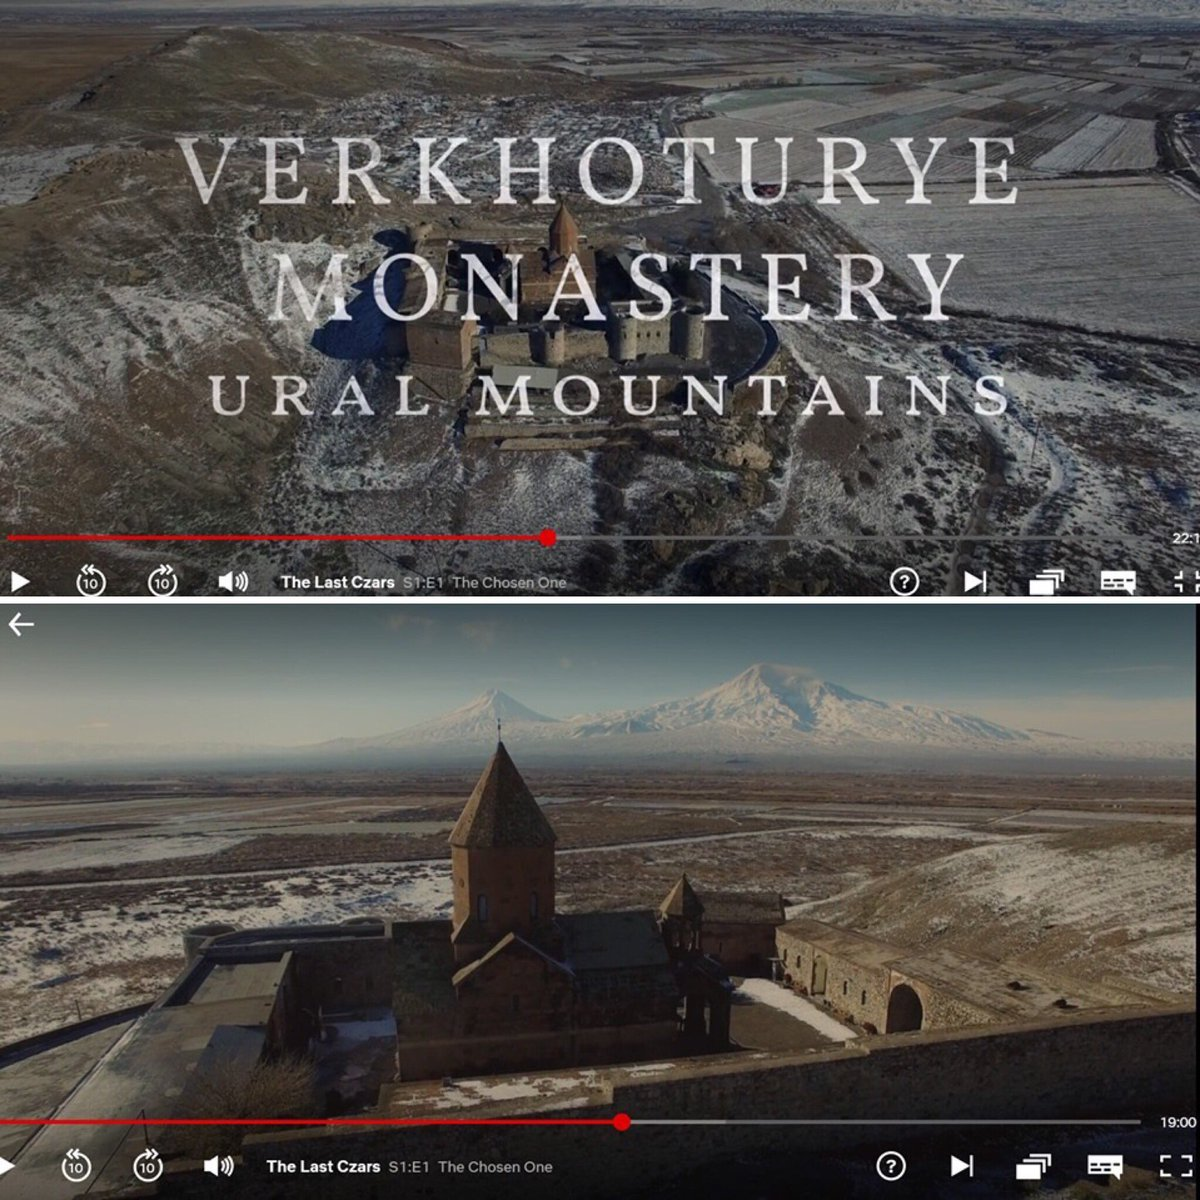 Netflix TV series the Last Czars used 7th-c Armenian Khor